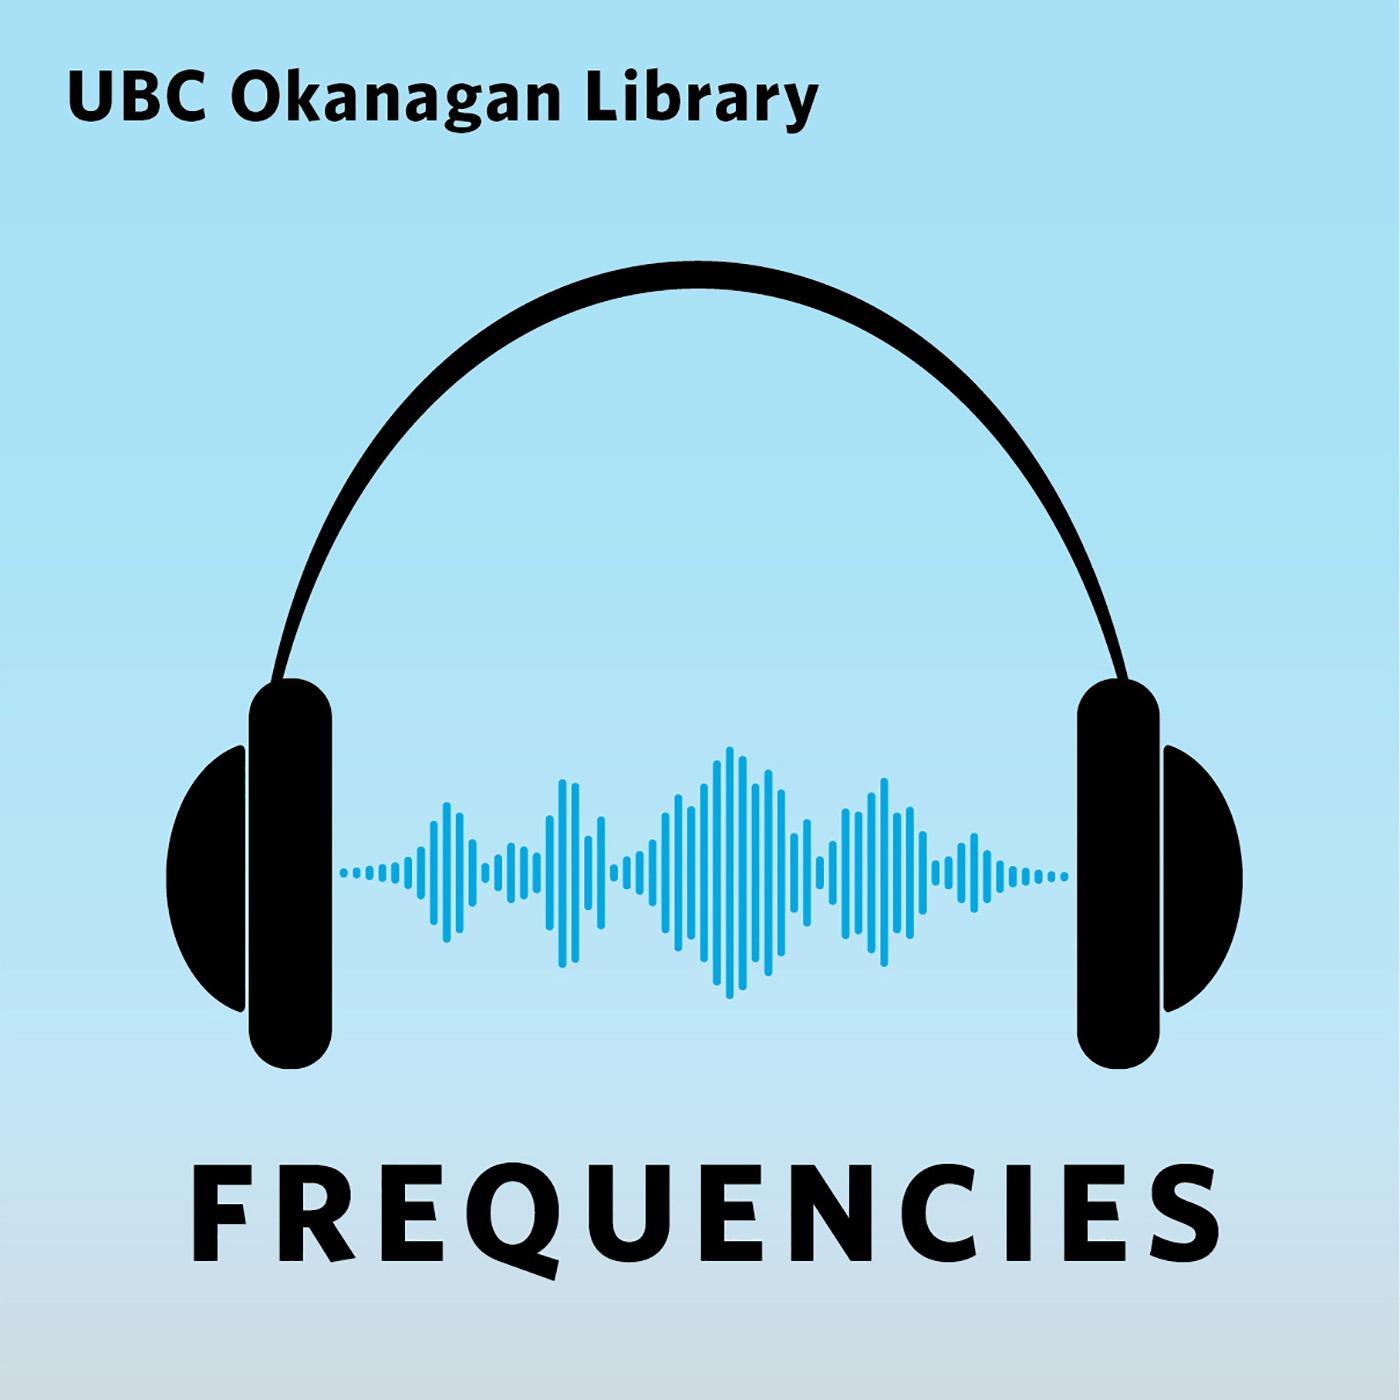 Frequencies show art